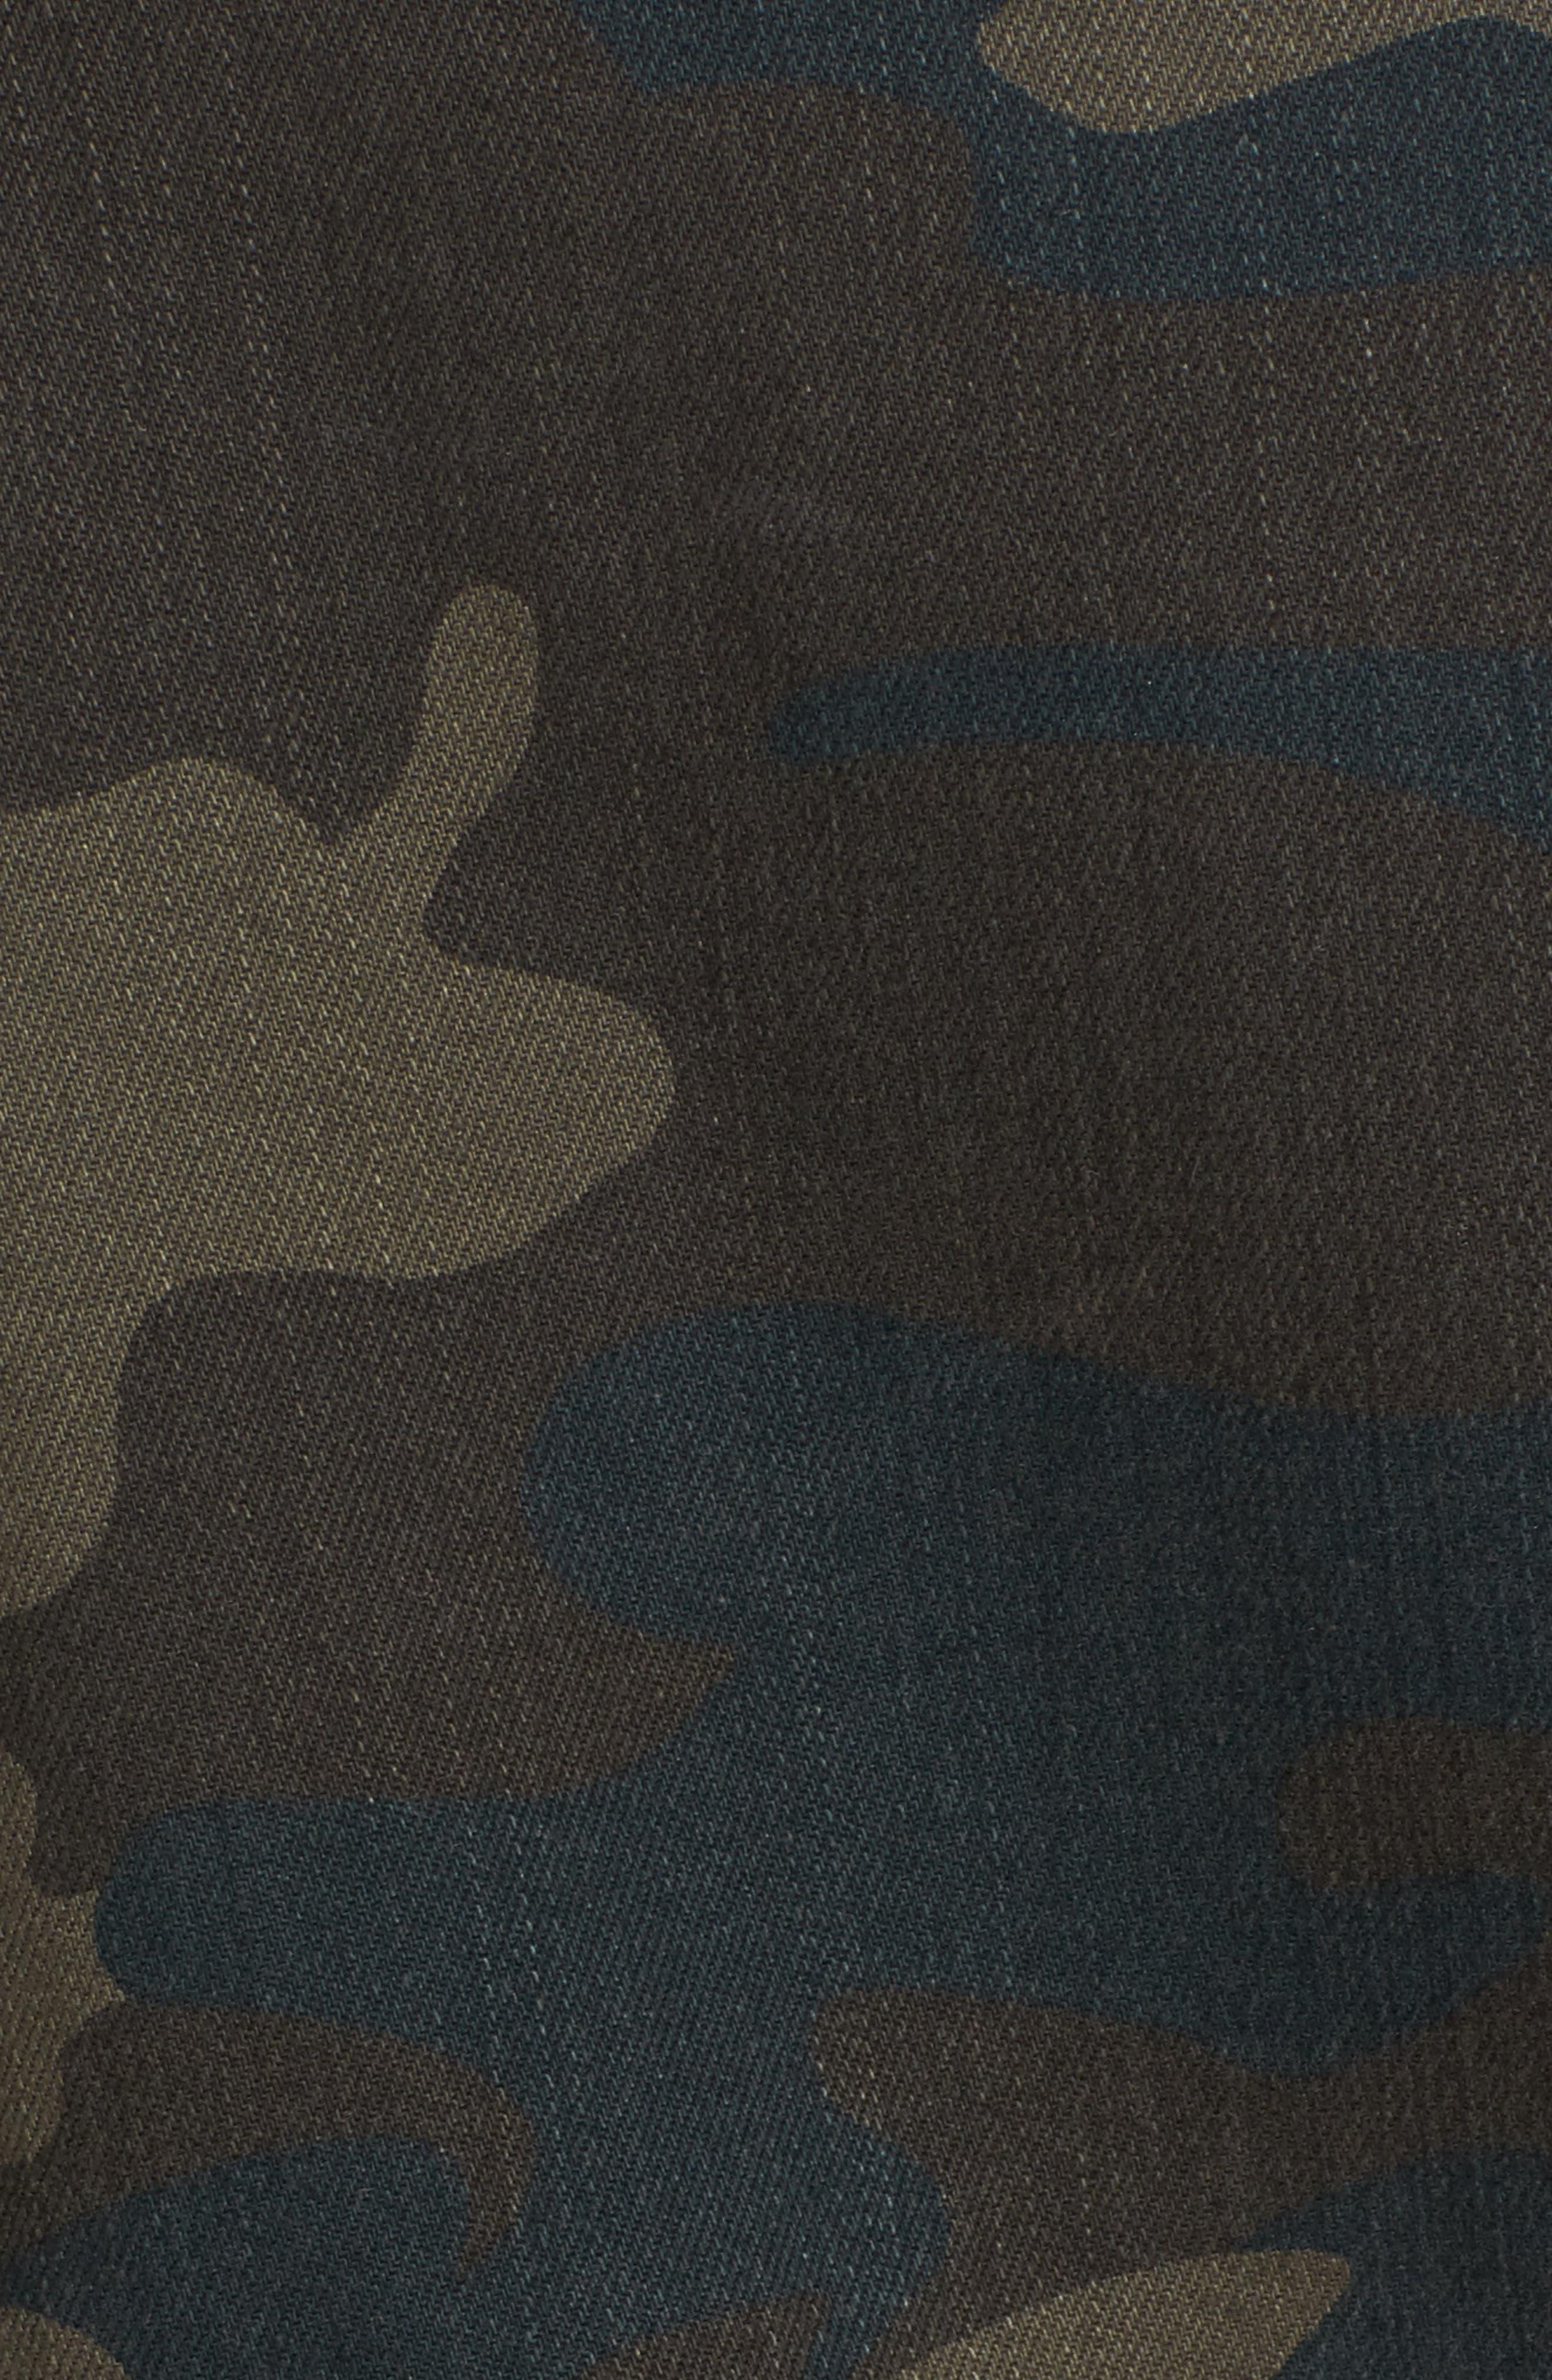 AFRM Studded Leopard Print Moto Jacket,                             Alternate thumbnail 12, color,